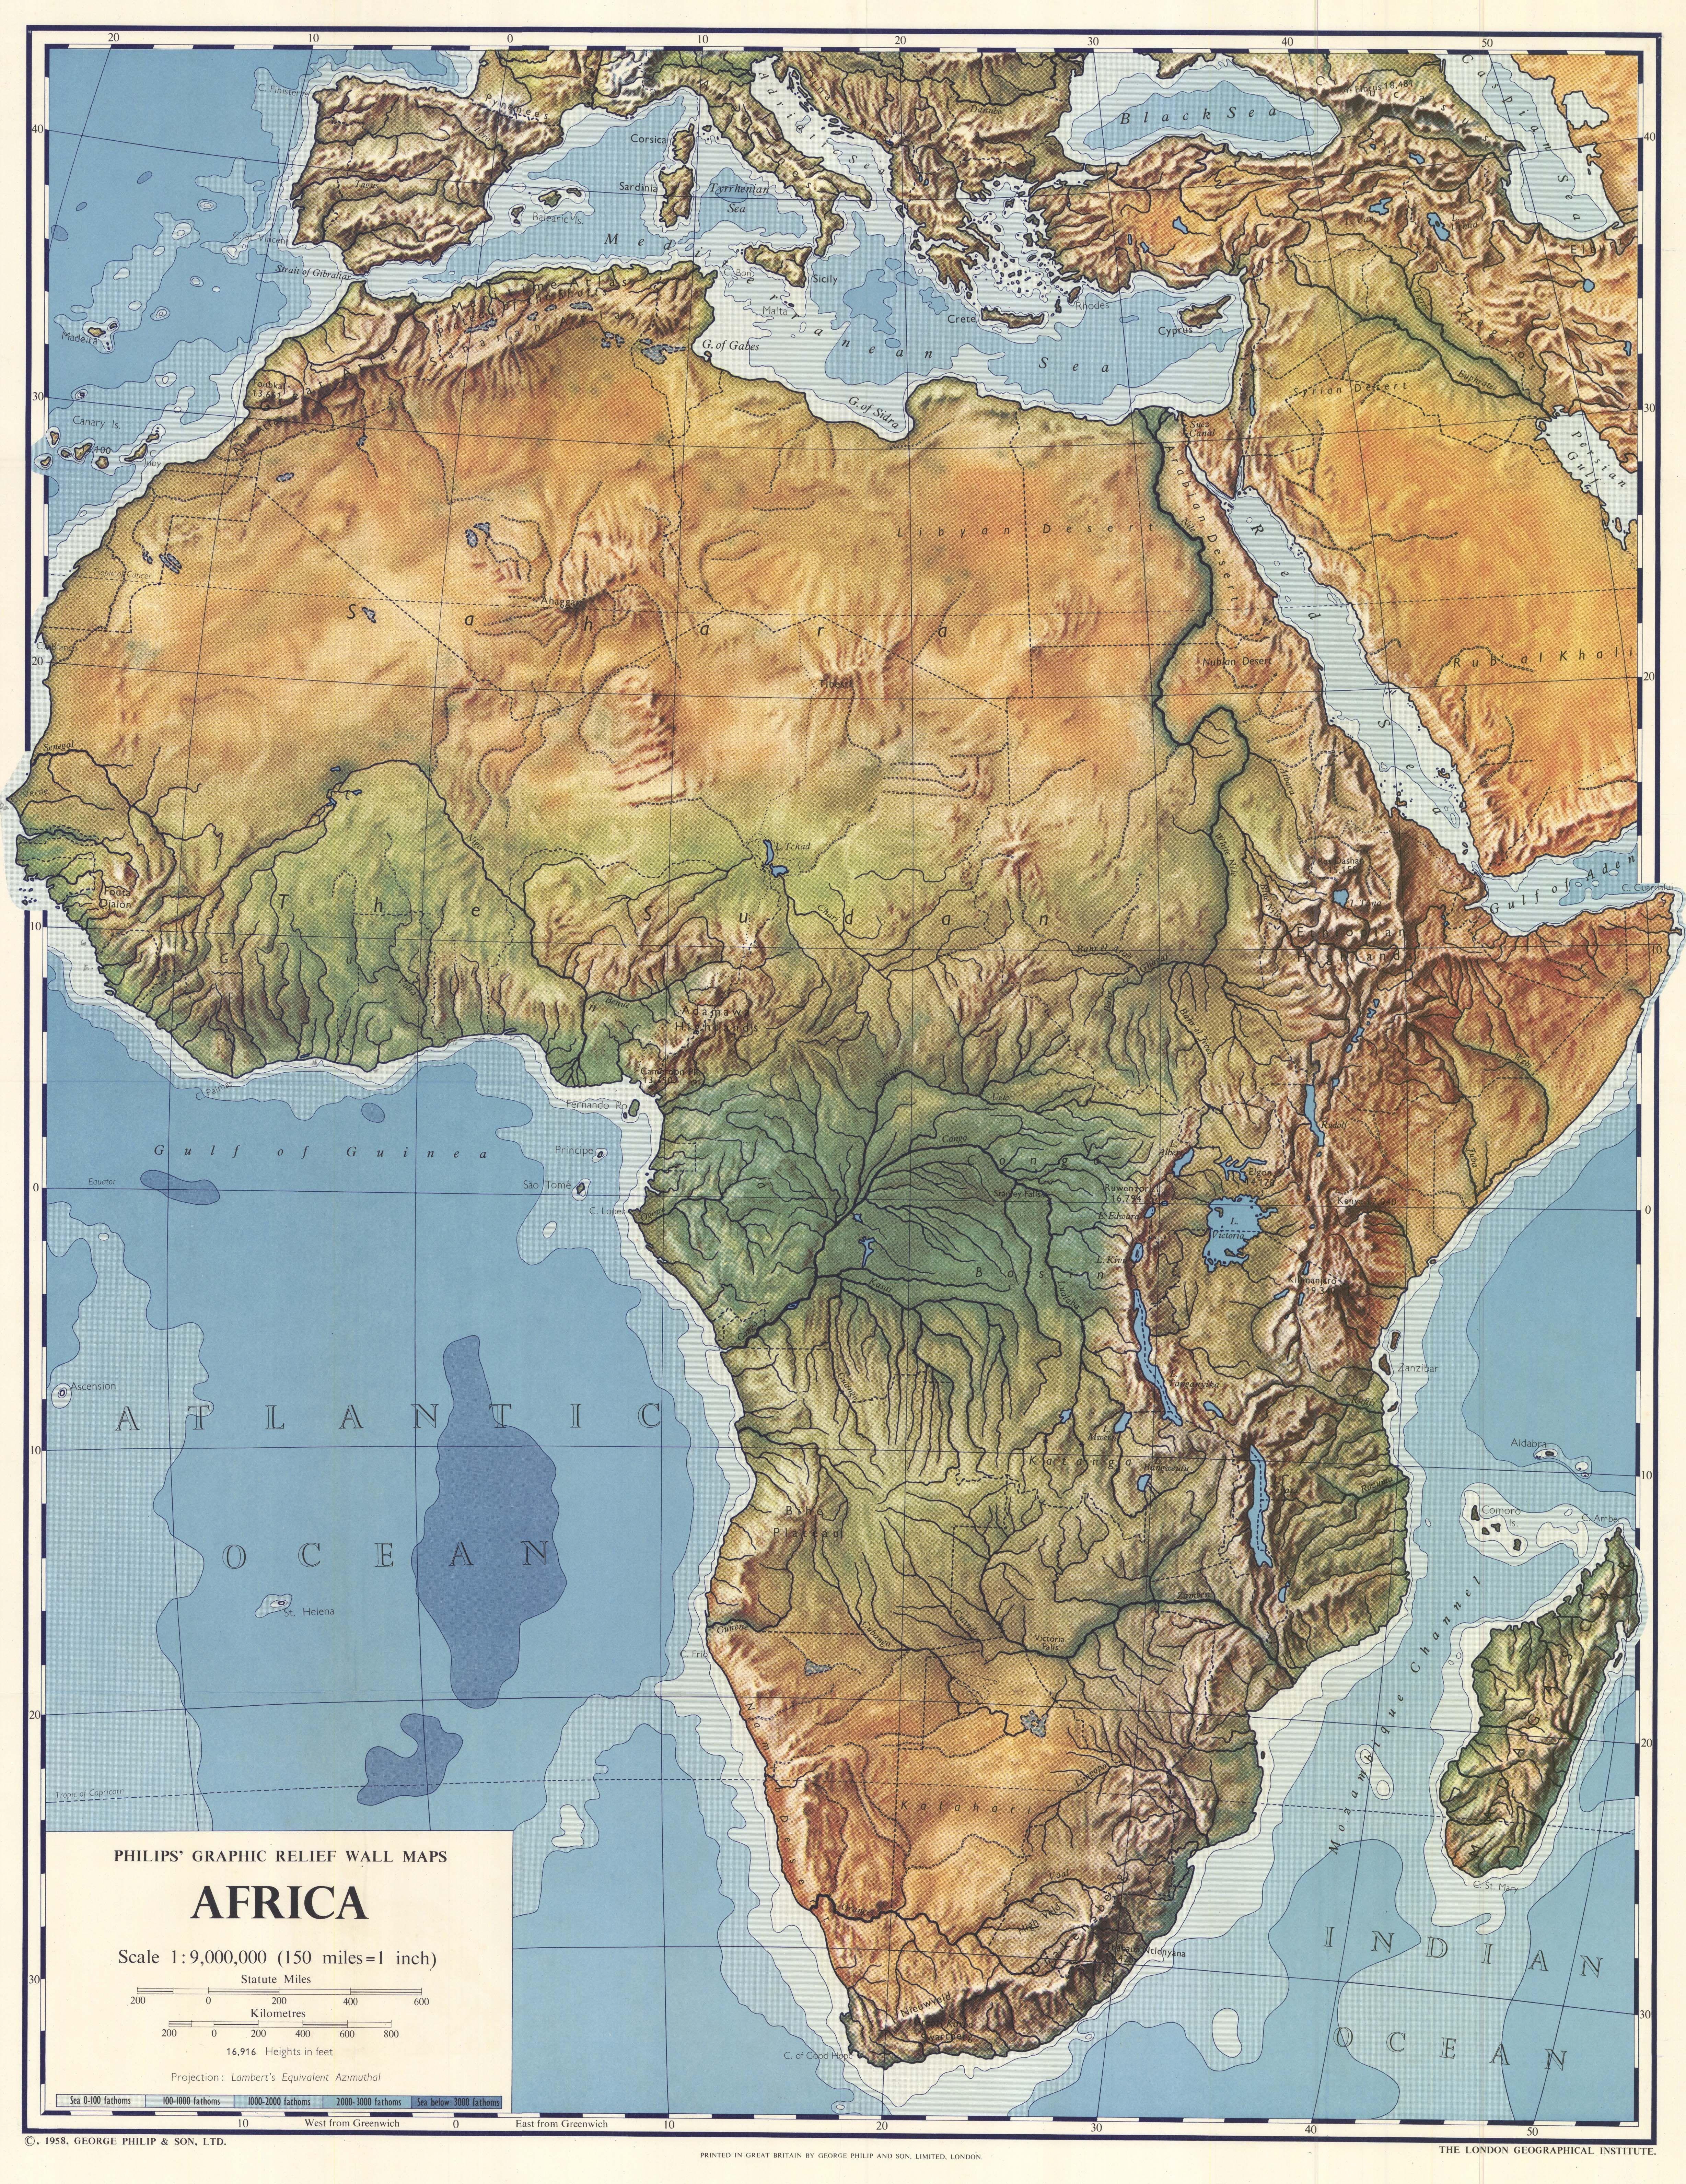 Africa-physical-map-1958.jpg (4913×6365)